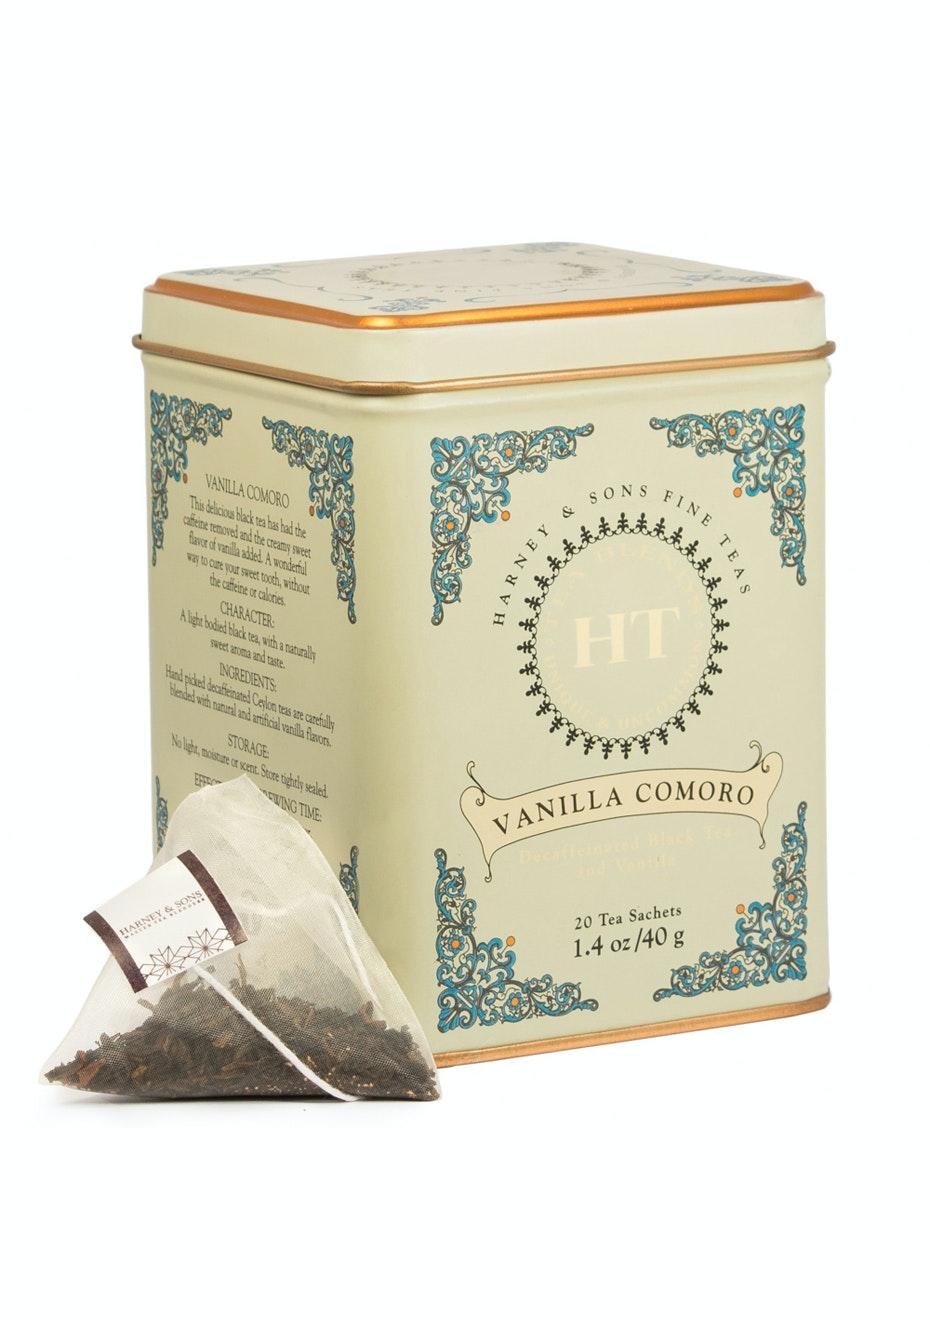 Harney & Sons - Vanilla Comoro - 20 Sachet Tin